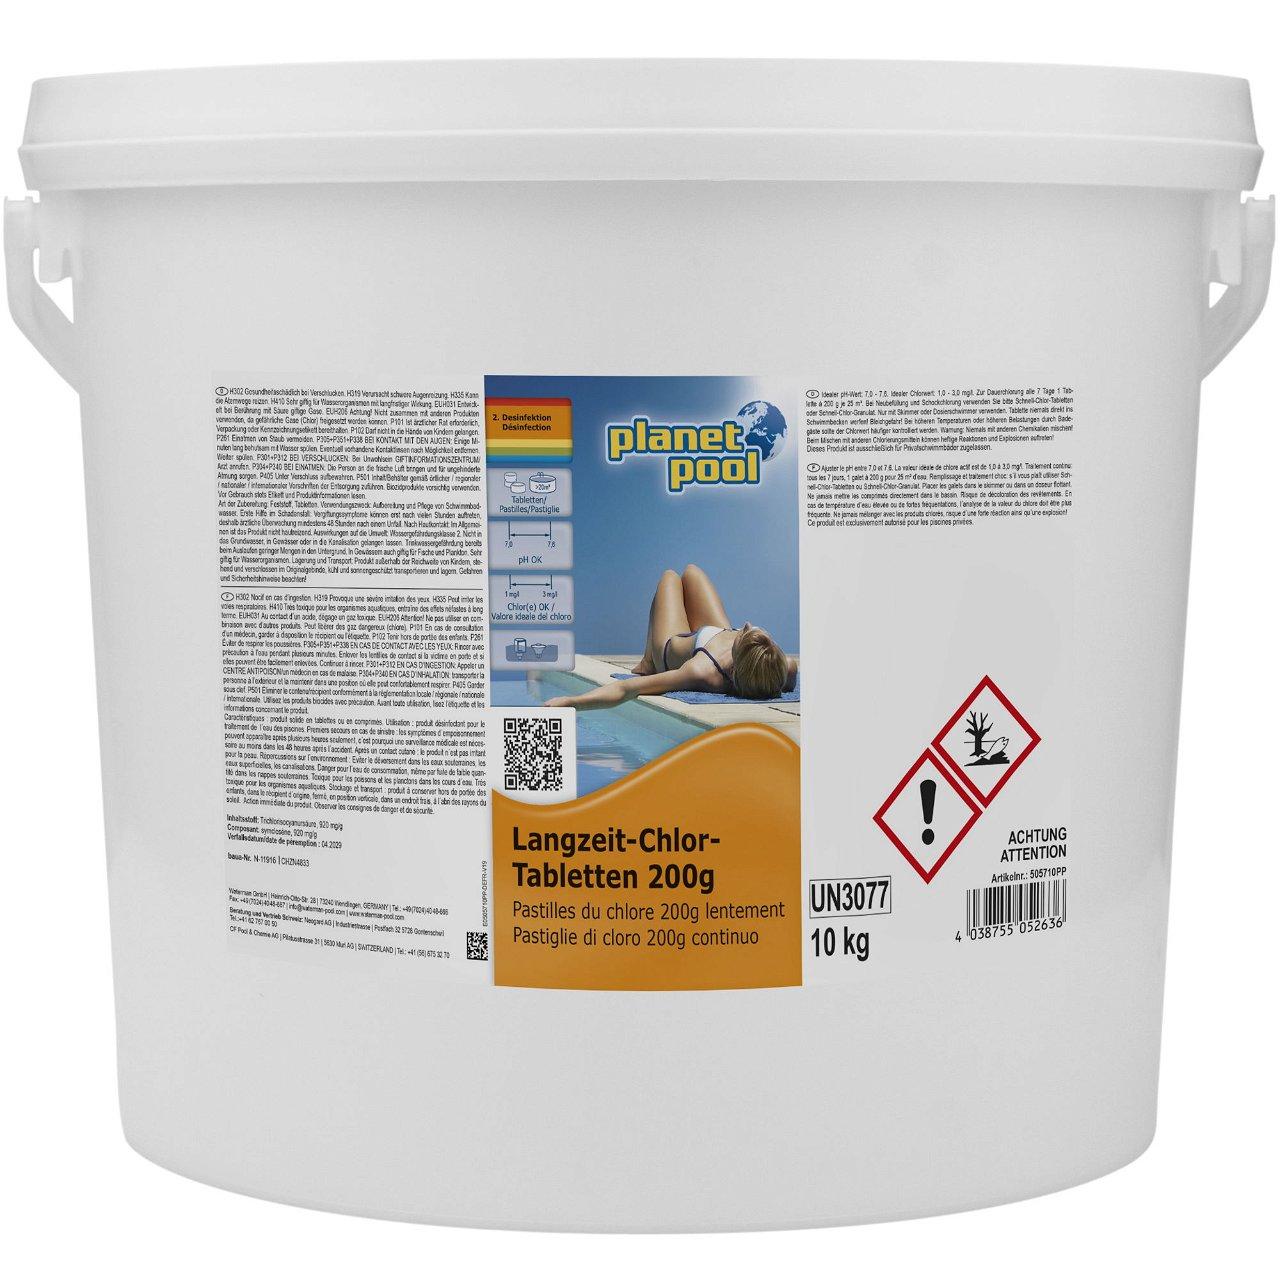 PLANET POOL Langzeit-Chlor-Tabletten 200g 10 kg